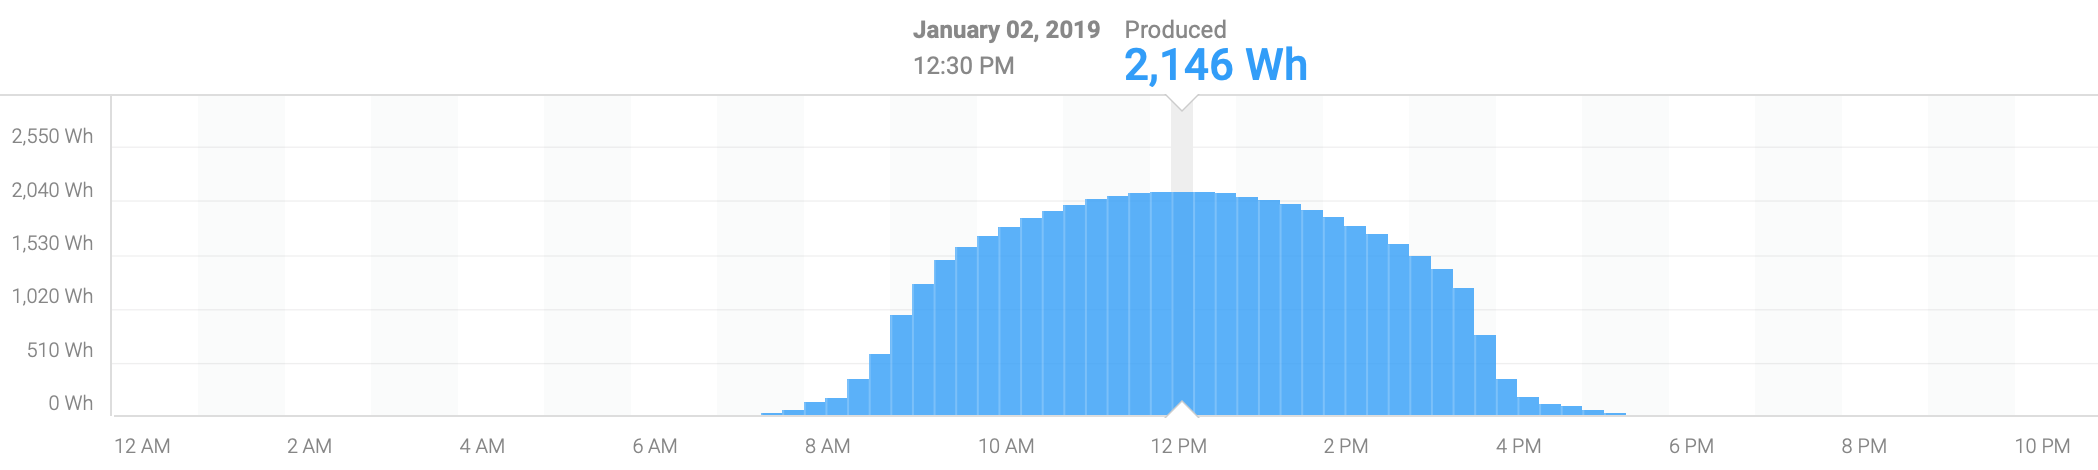 Florida Solar Generation January.png